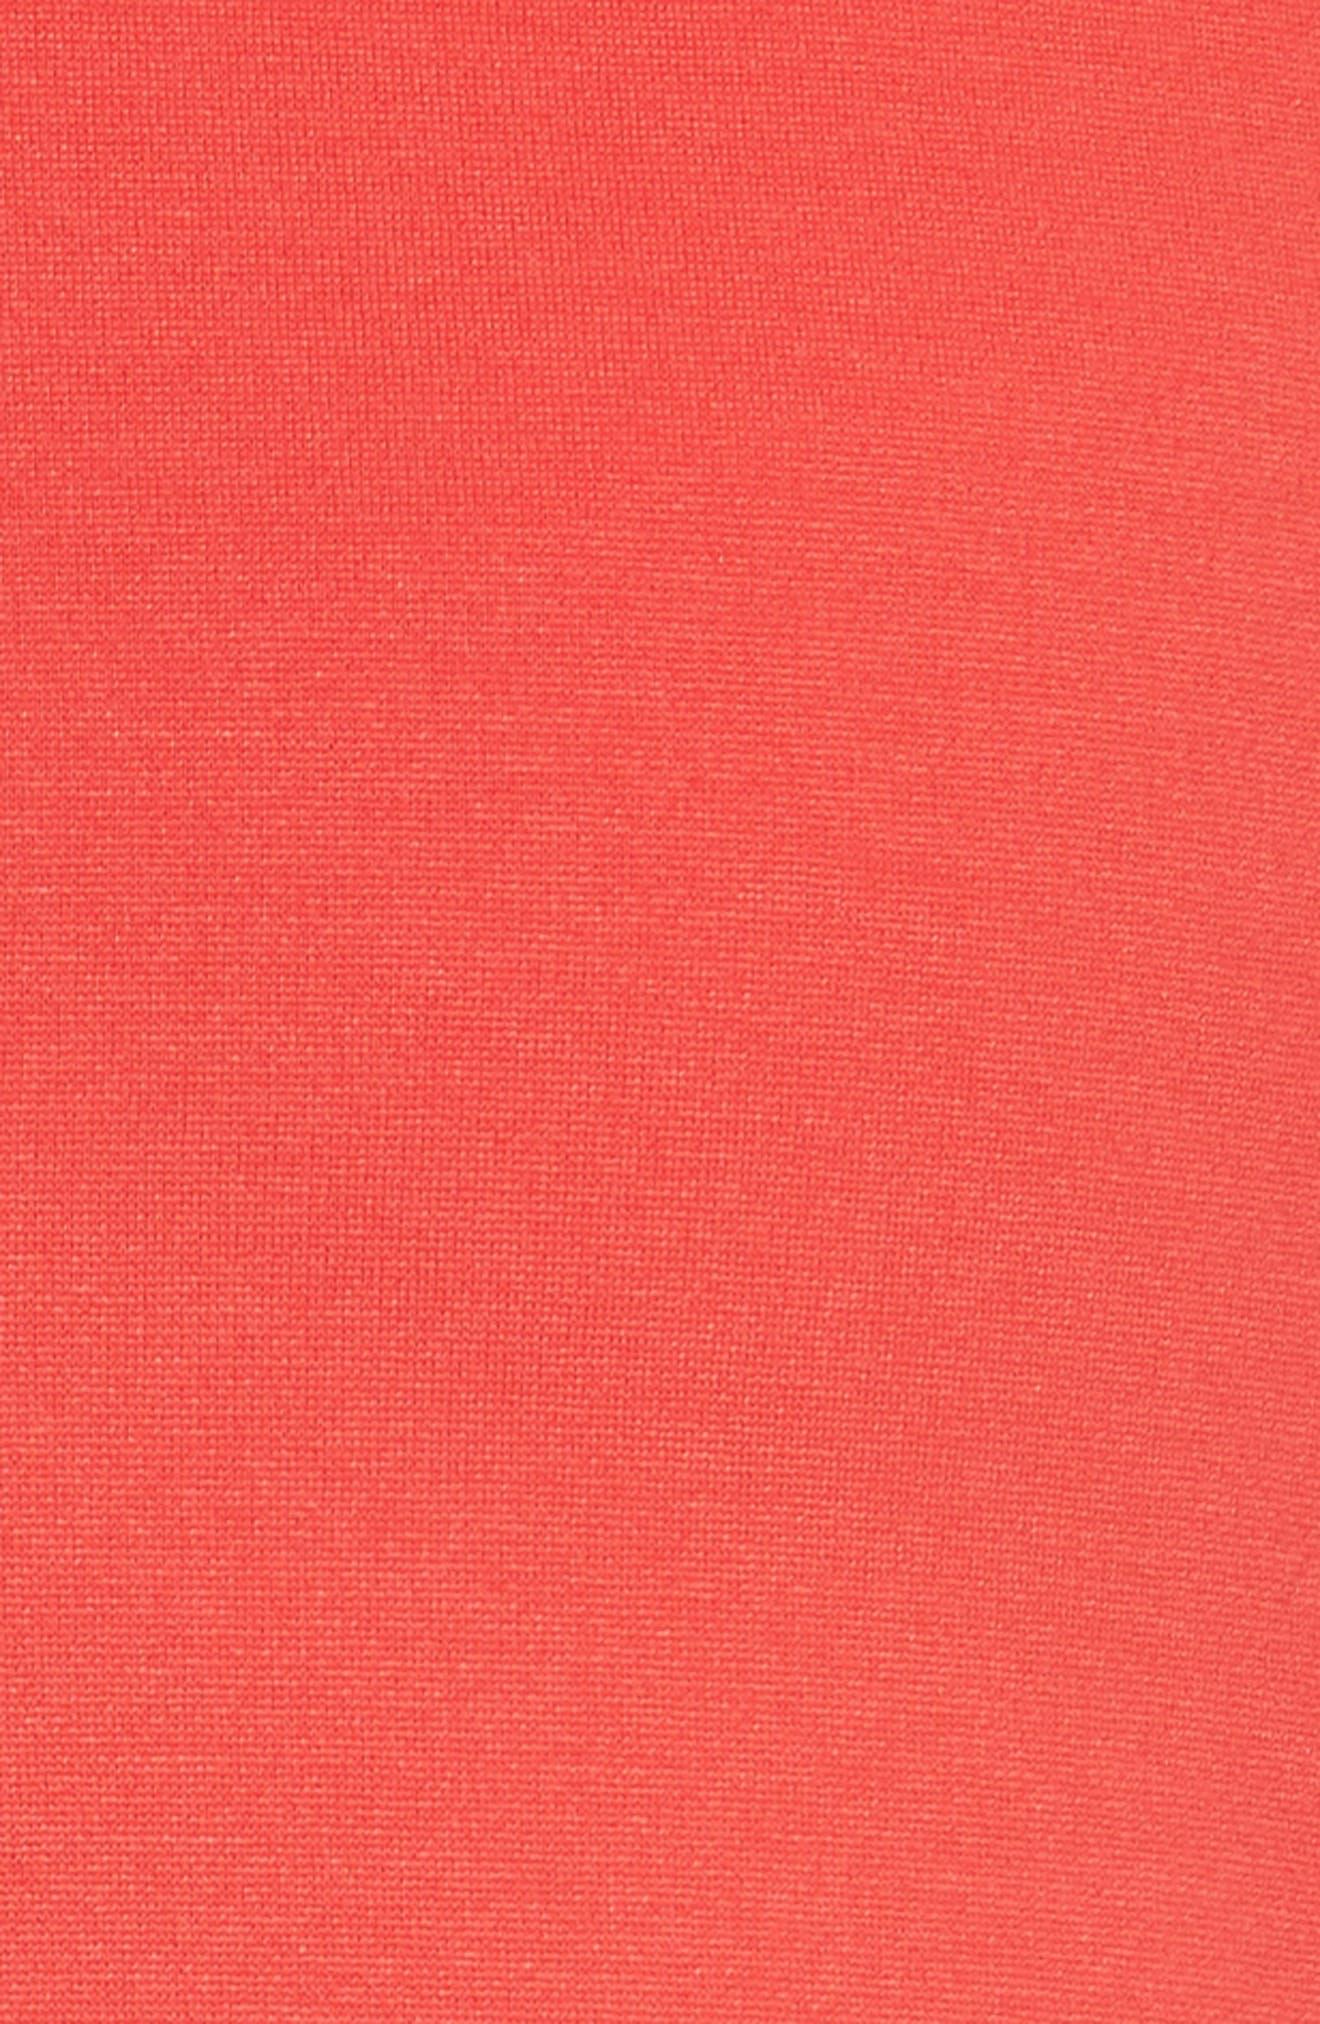 Milano Jersey Pencil Skirt,                             Alternate thumbnail 6, color,                             Solid Bright Orange